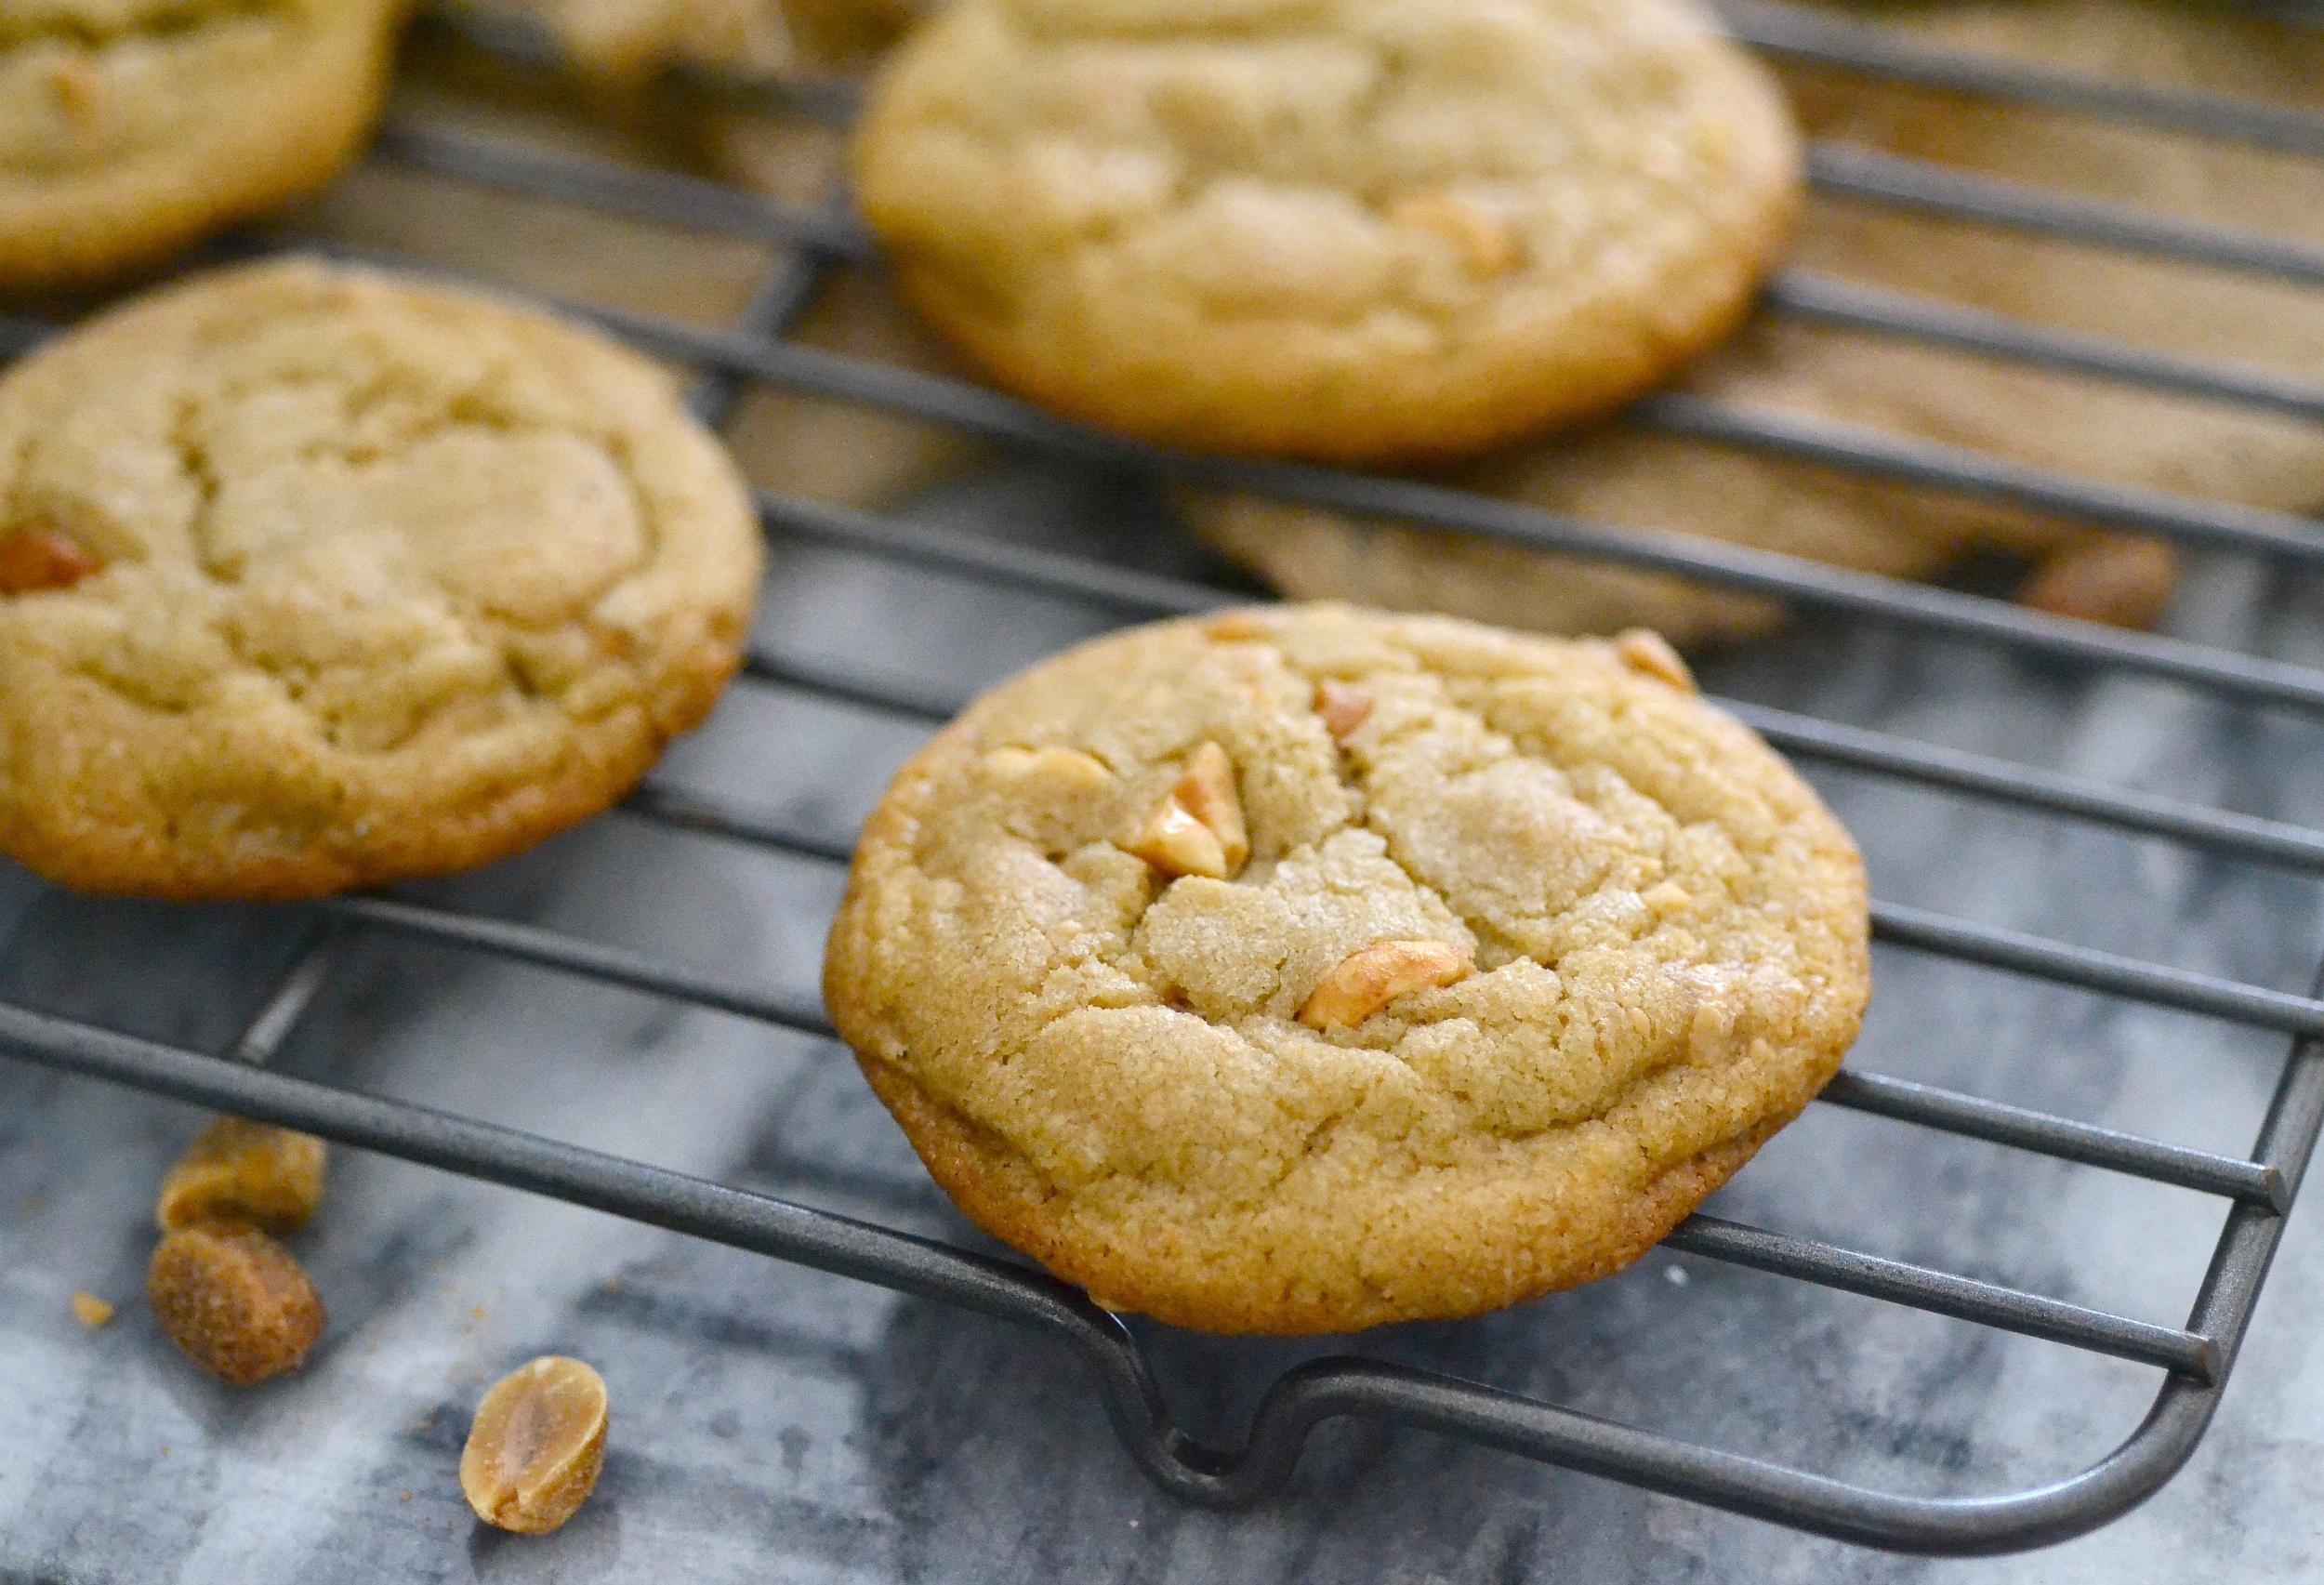 Gluten free Peanut Butter Coconut Oil Cookies | The ...